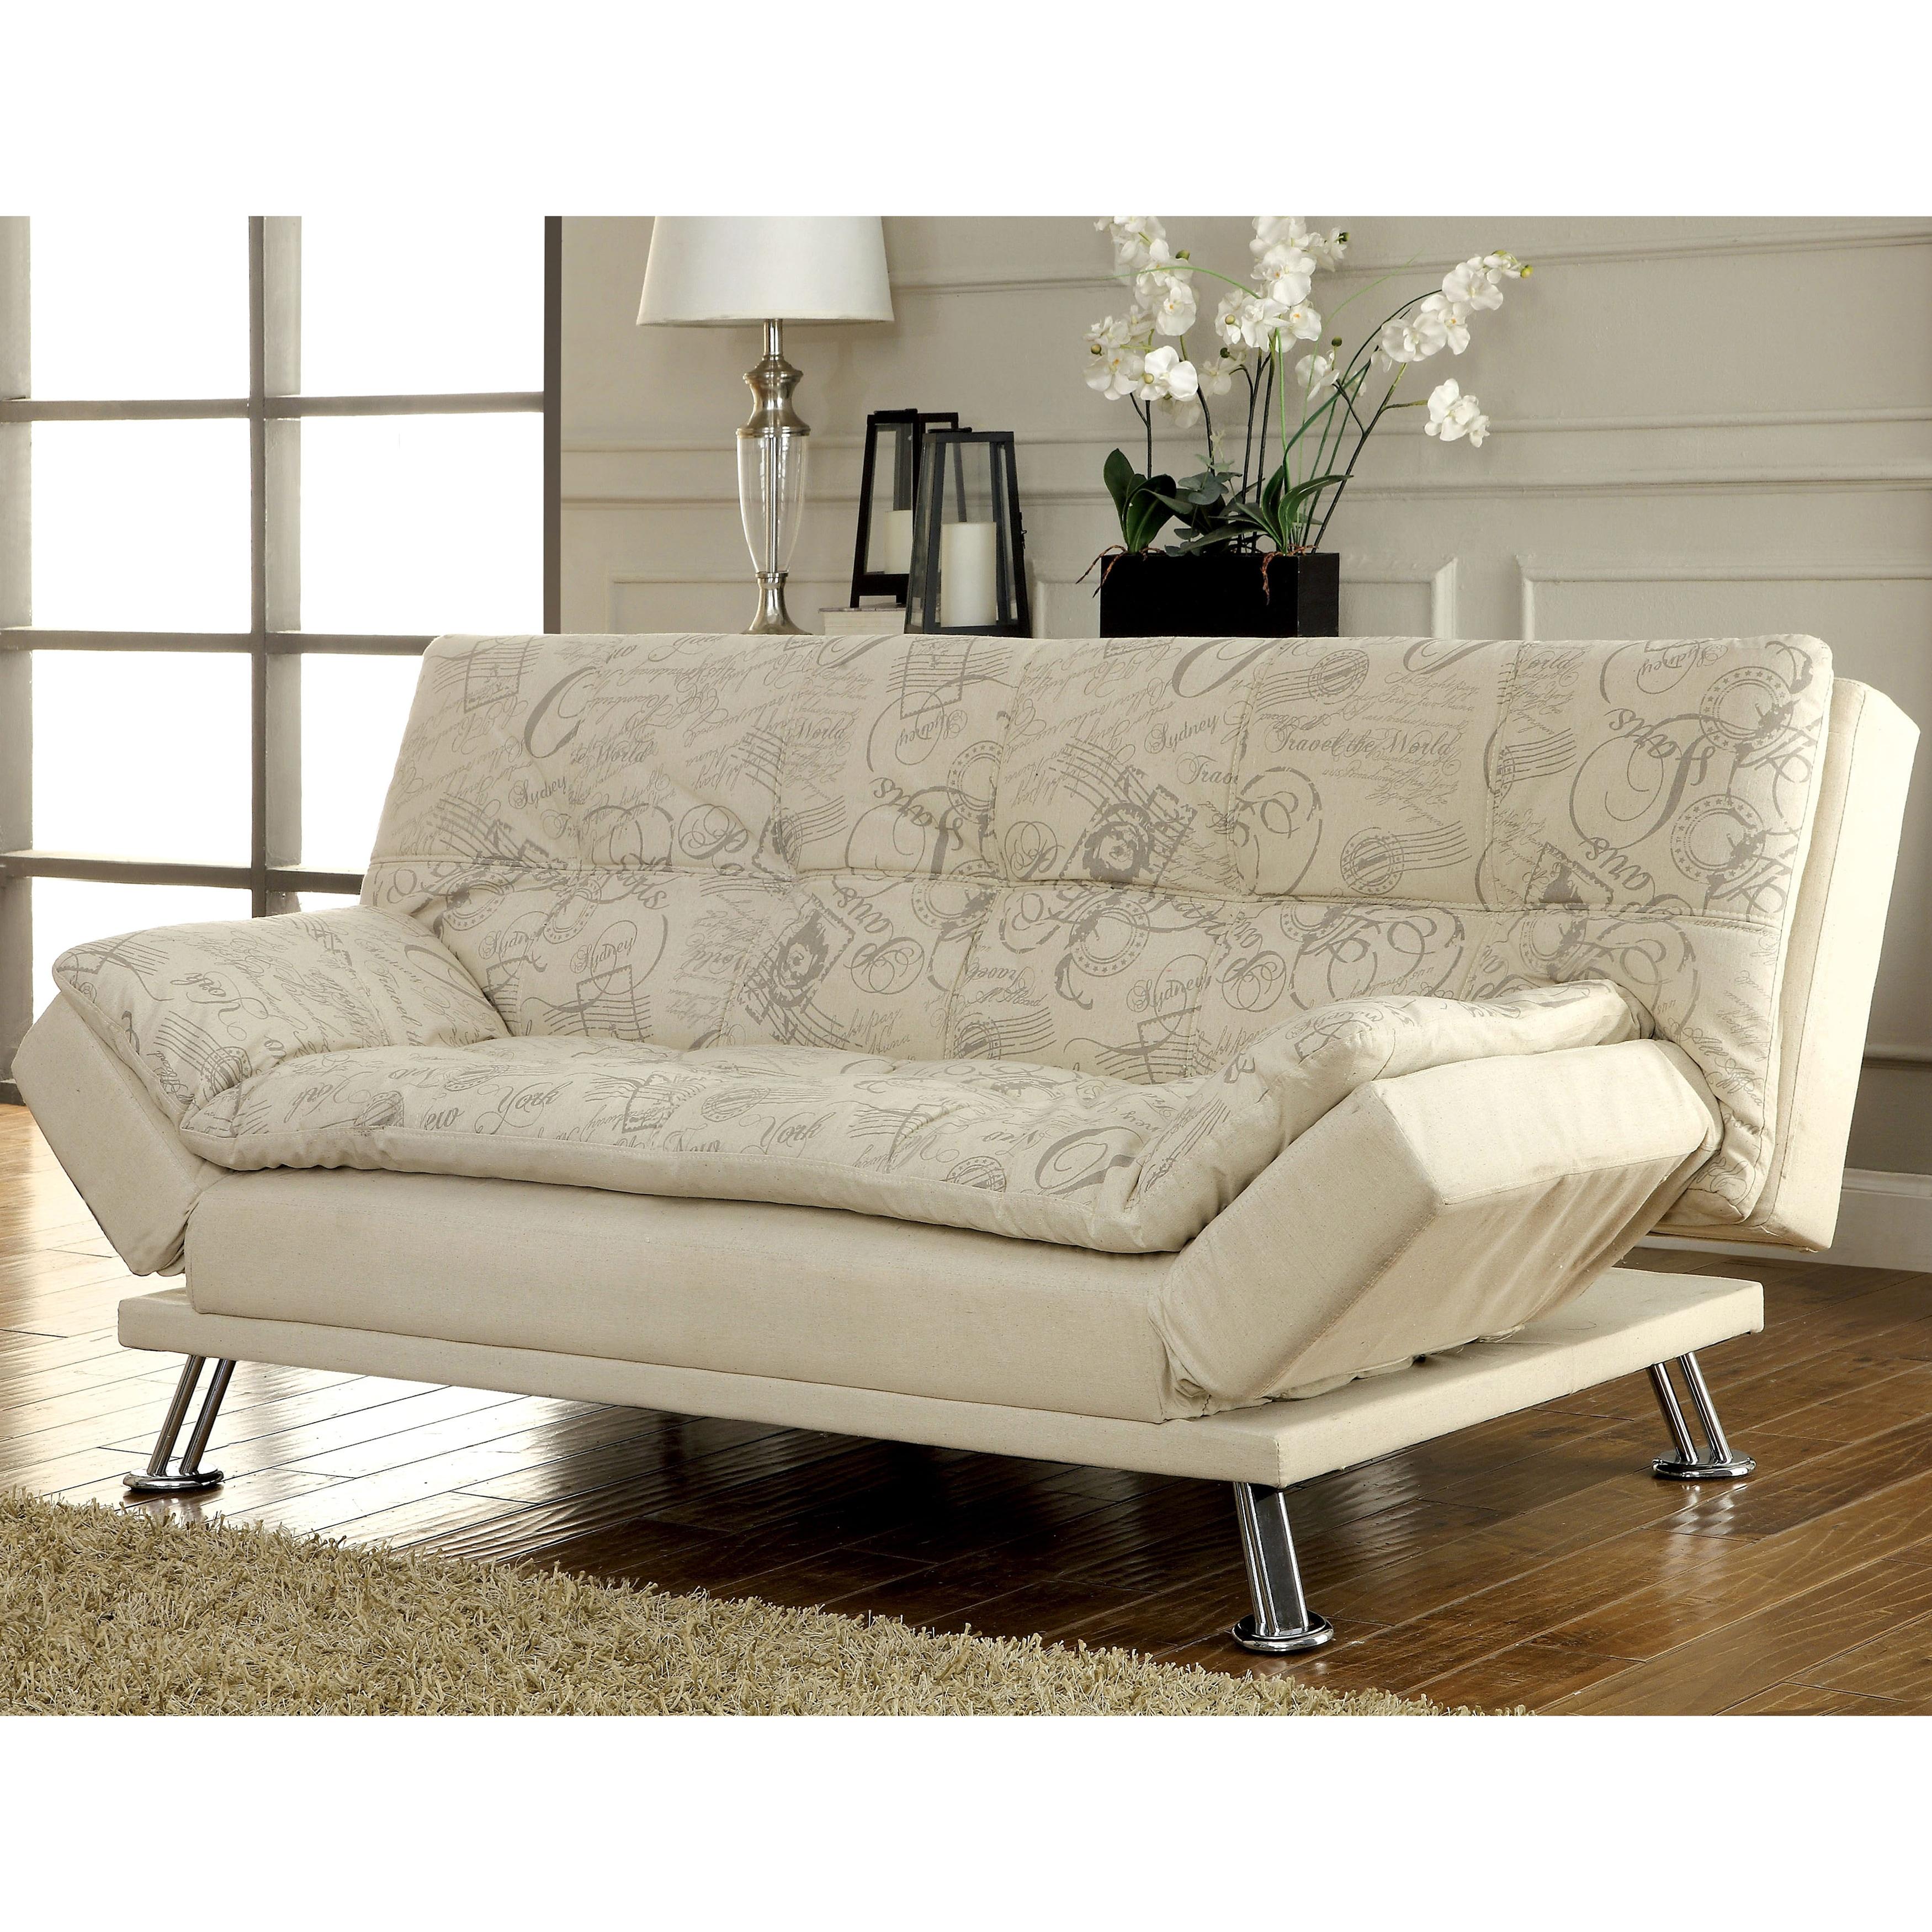 Remarkable Aubreth Modern Futon Sofa By Foa Interior Design Ideas Skatsoteloinfo